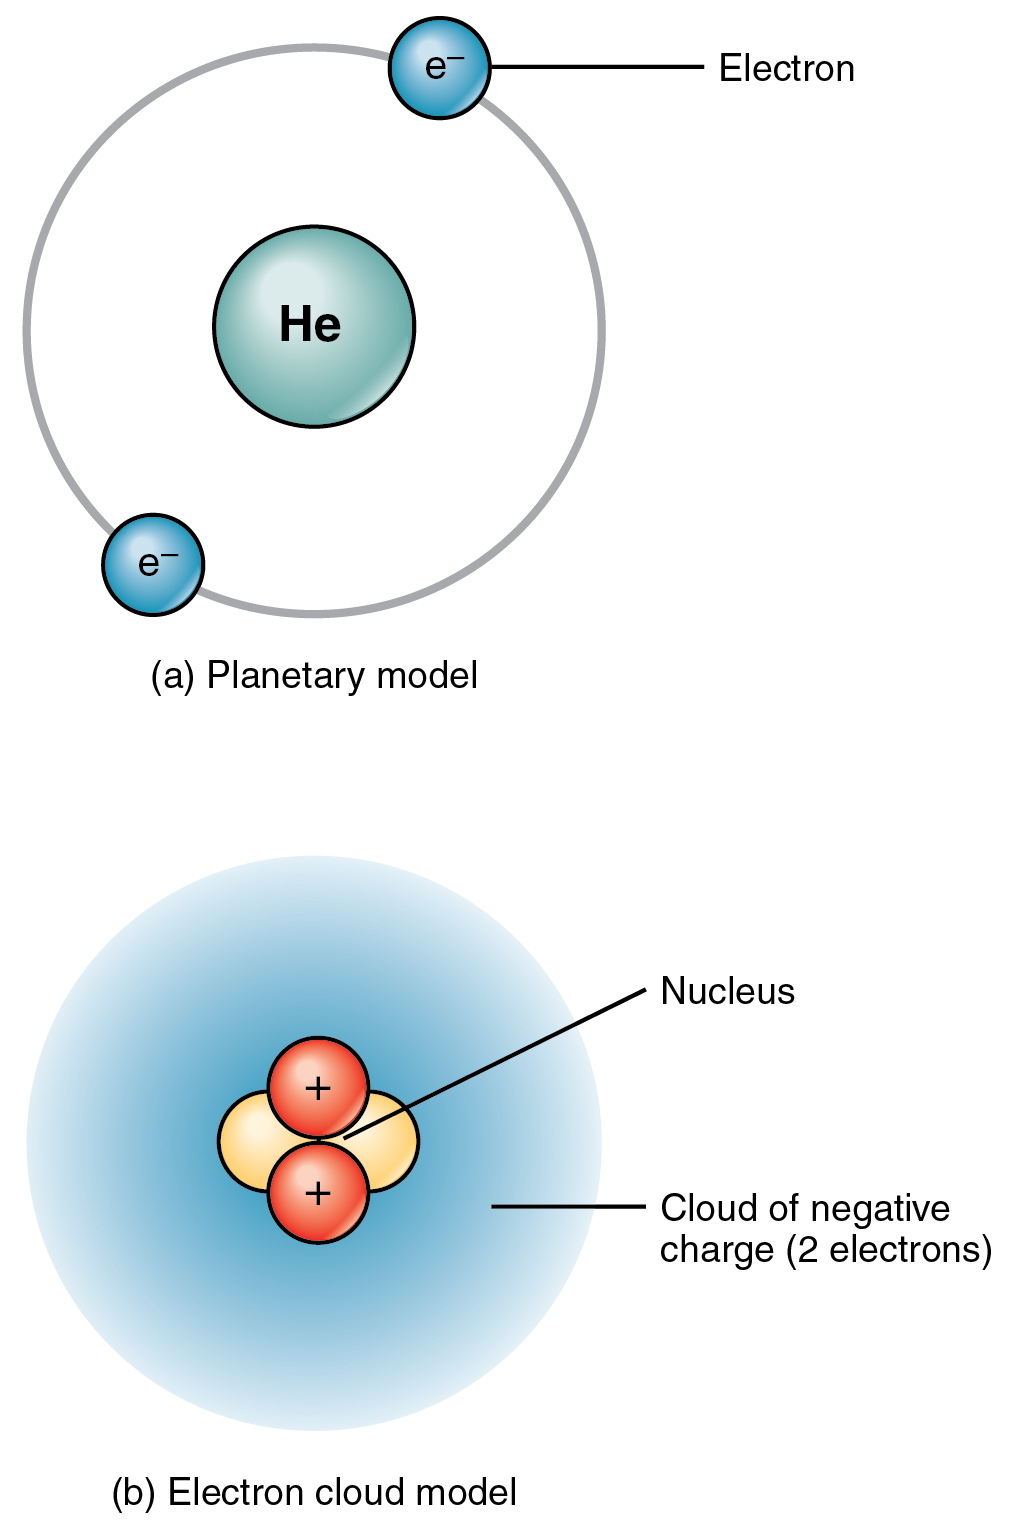 Planetary vs Electron cloud model